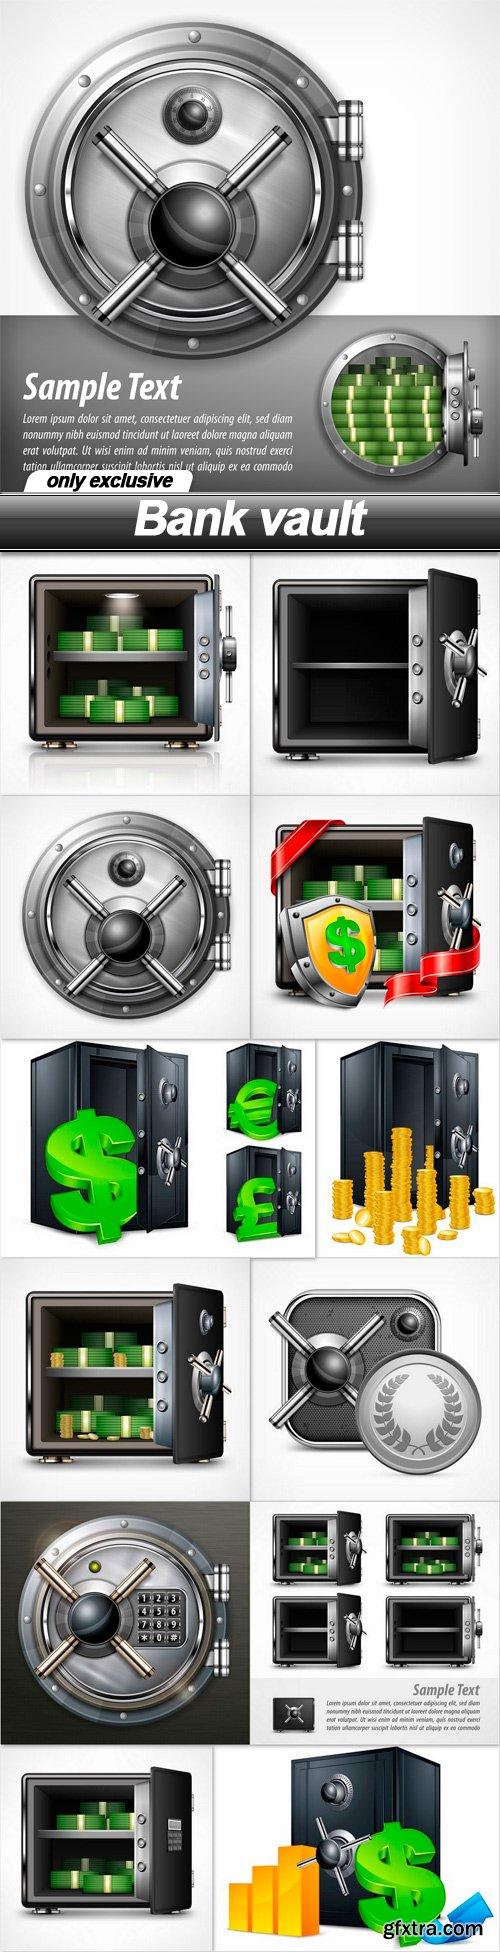 Bank vault - 13 EPS